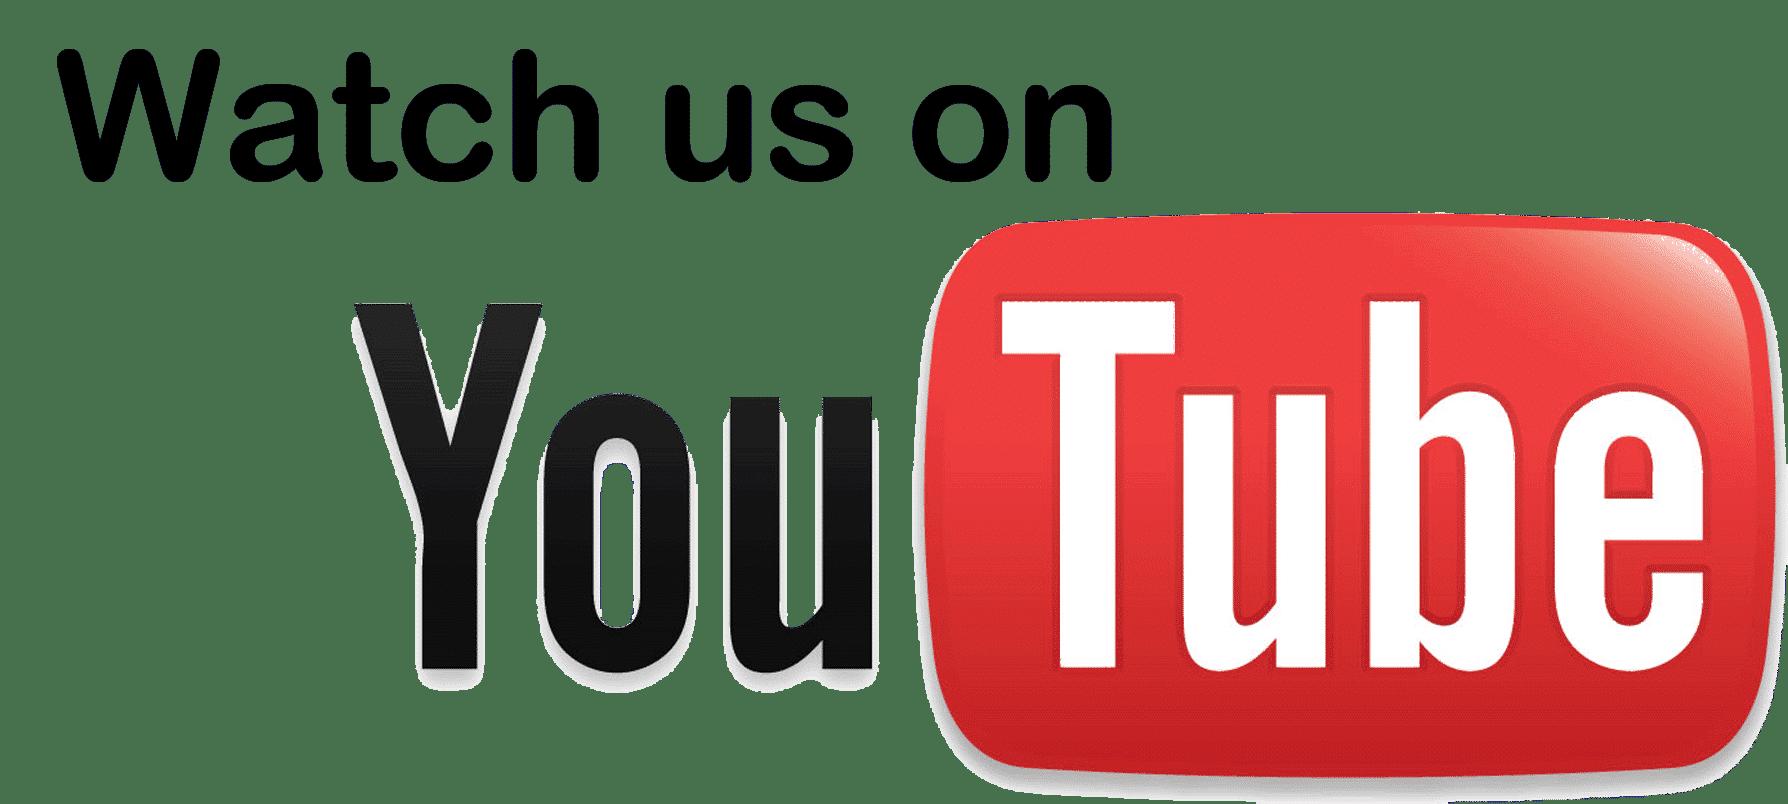 watch us on YouTube logo